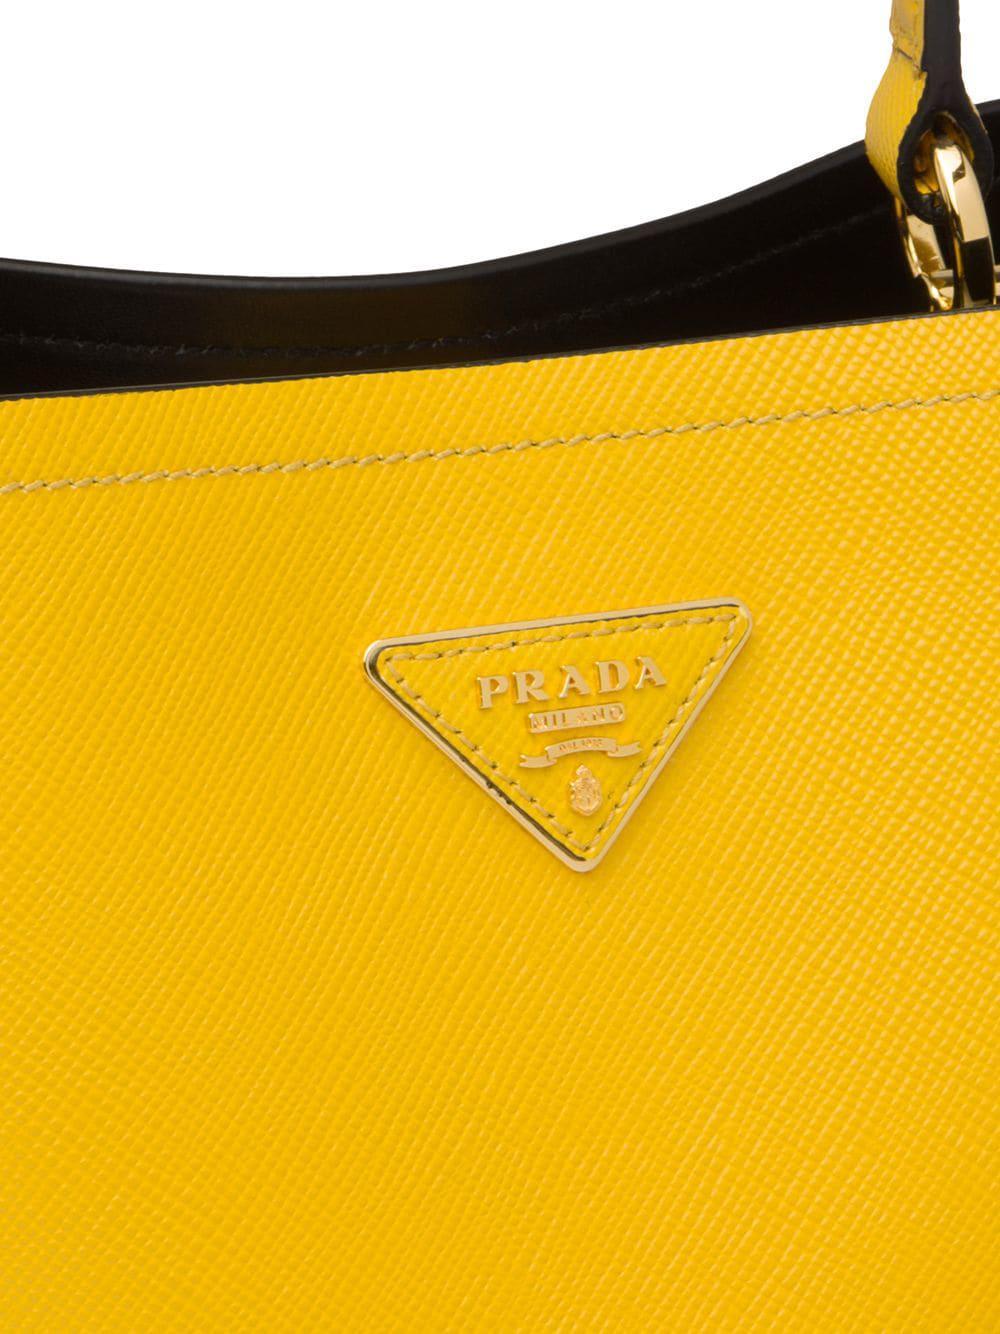 6af89182014d Prada - Yellow Double Medium Bag - Lyst. View fullscreen